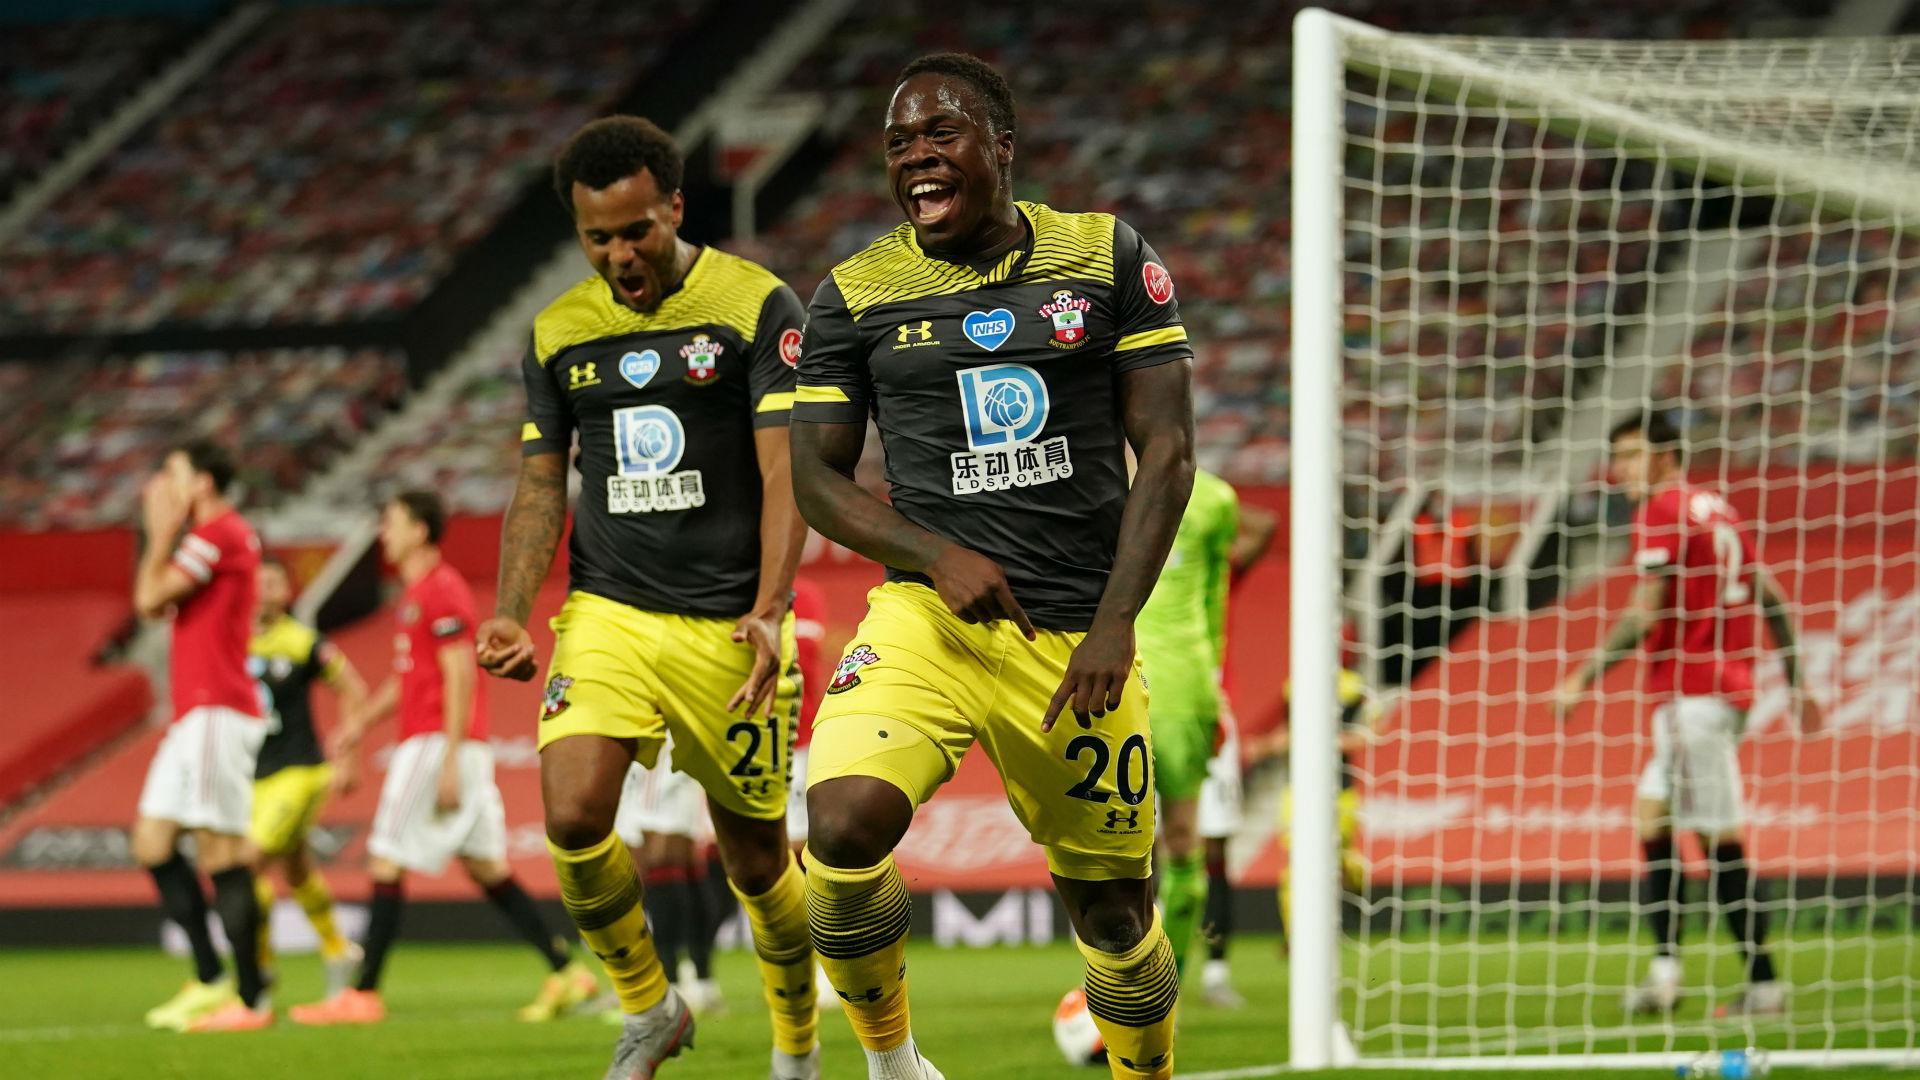 Manchester United V Southampton Match Report 13 07 2020 Premier League Goal Com